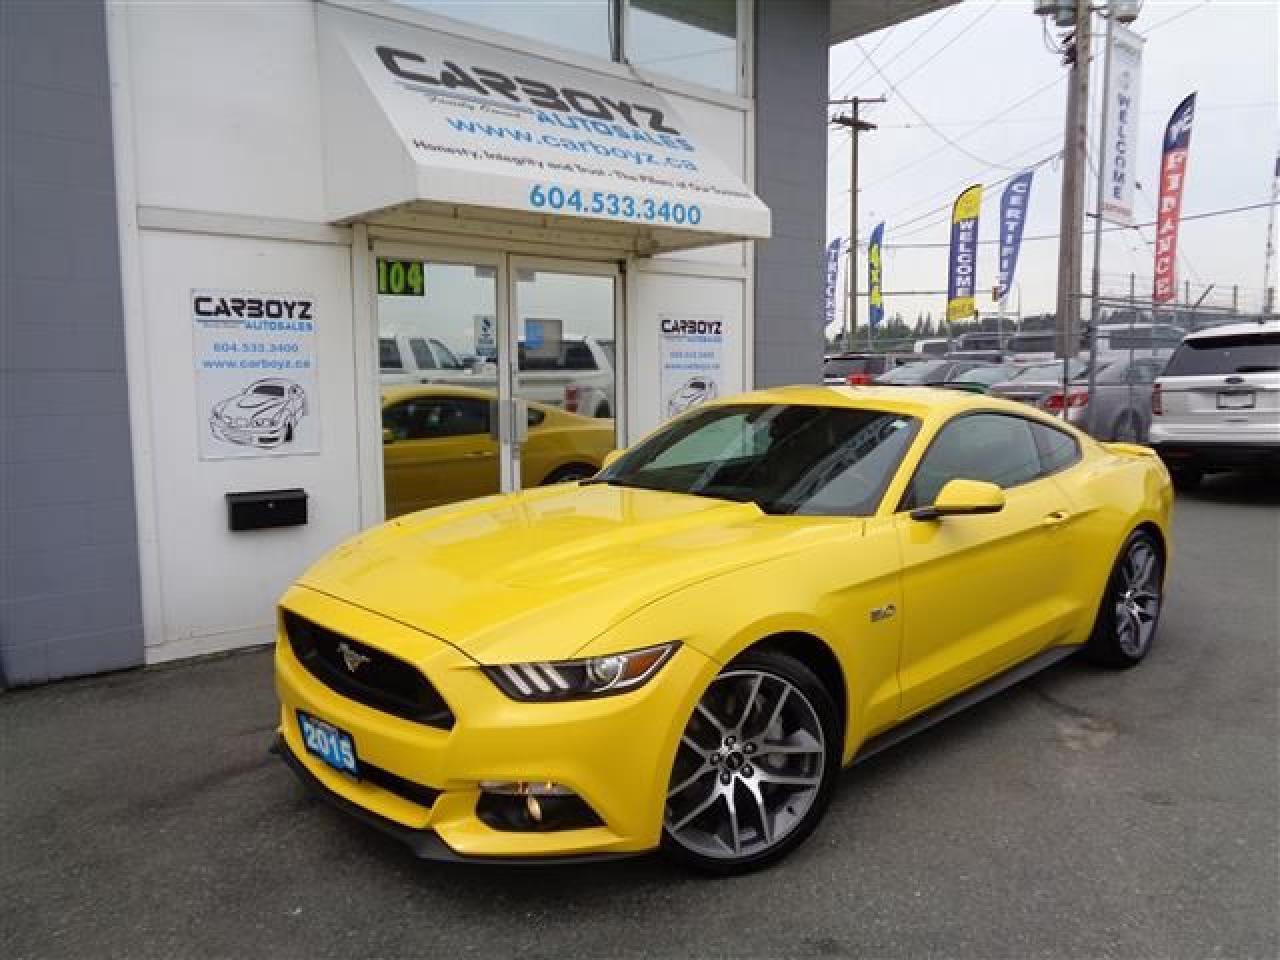 2015 Ford Mustang GT Premium 5.0L, Nav, Roush Exhaust